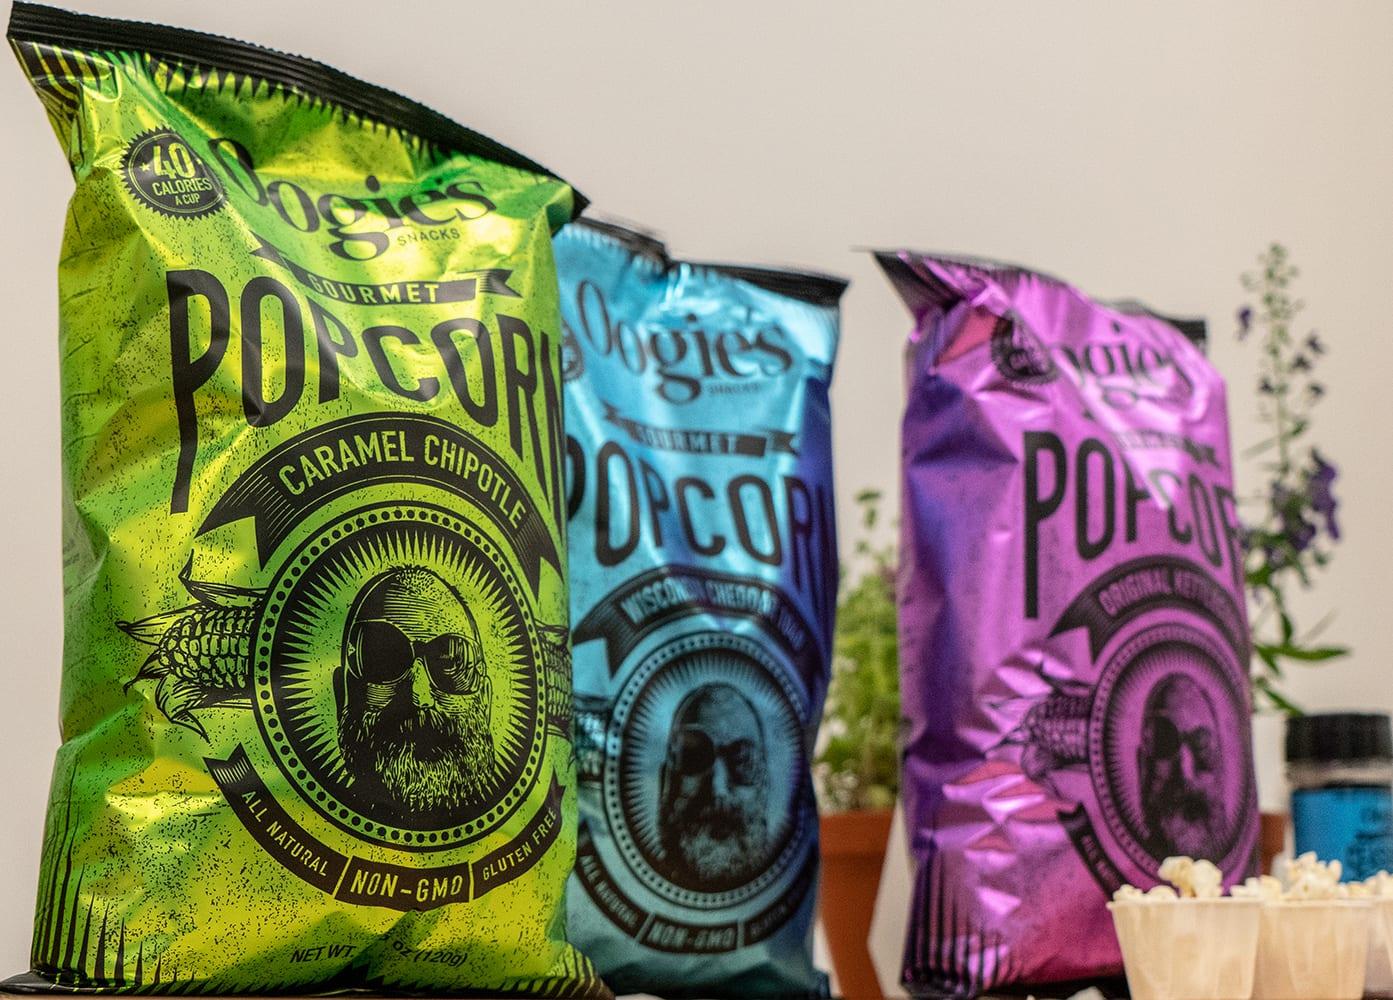 Oogie's Gourmet Popcorn Caramel Chipotle